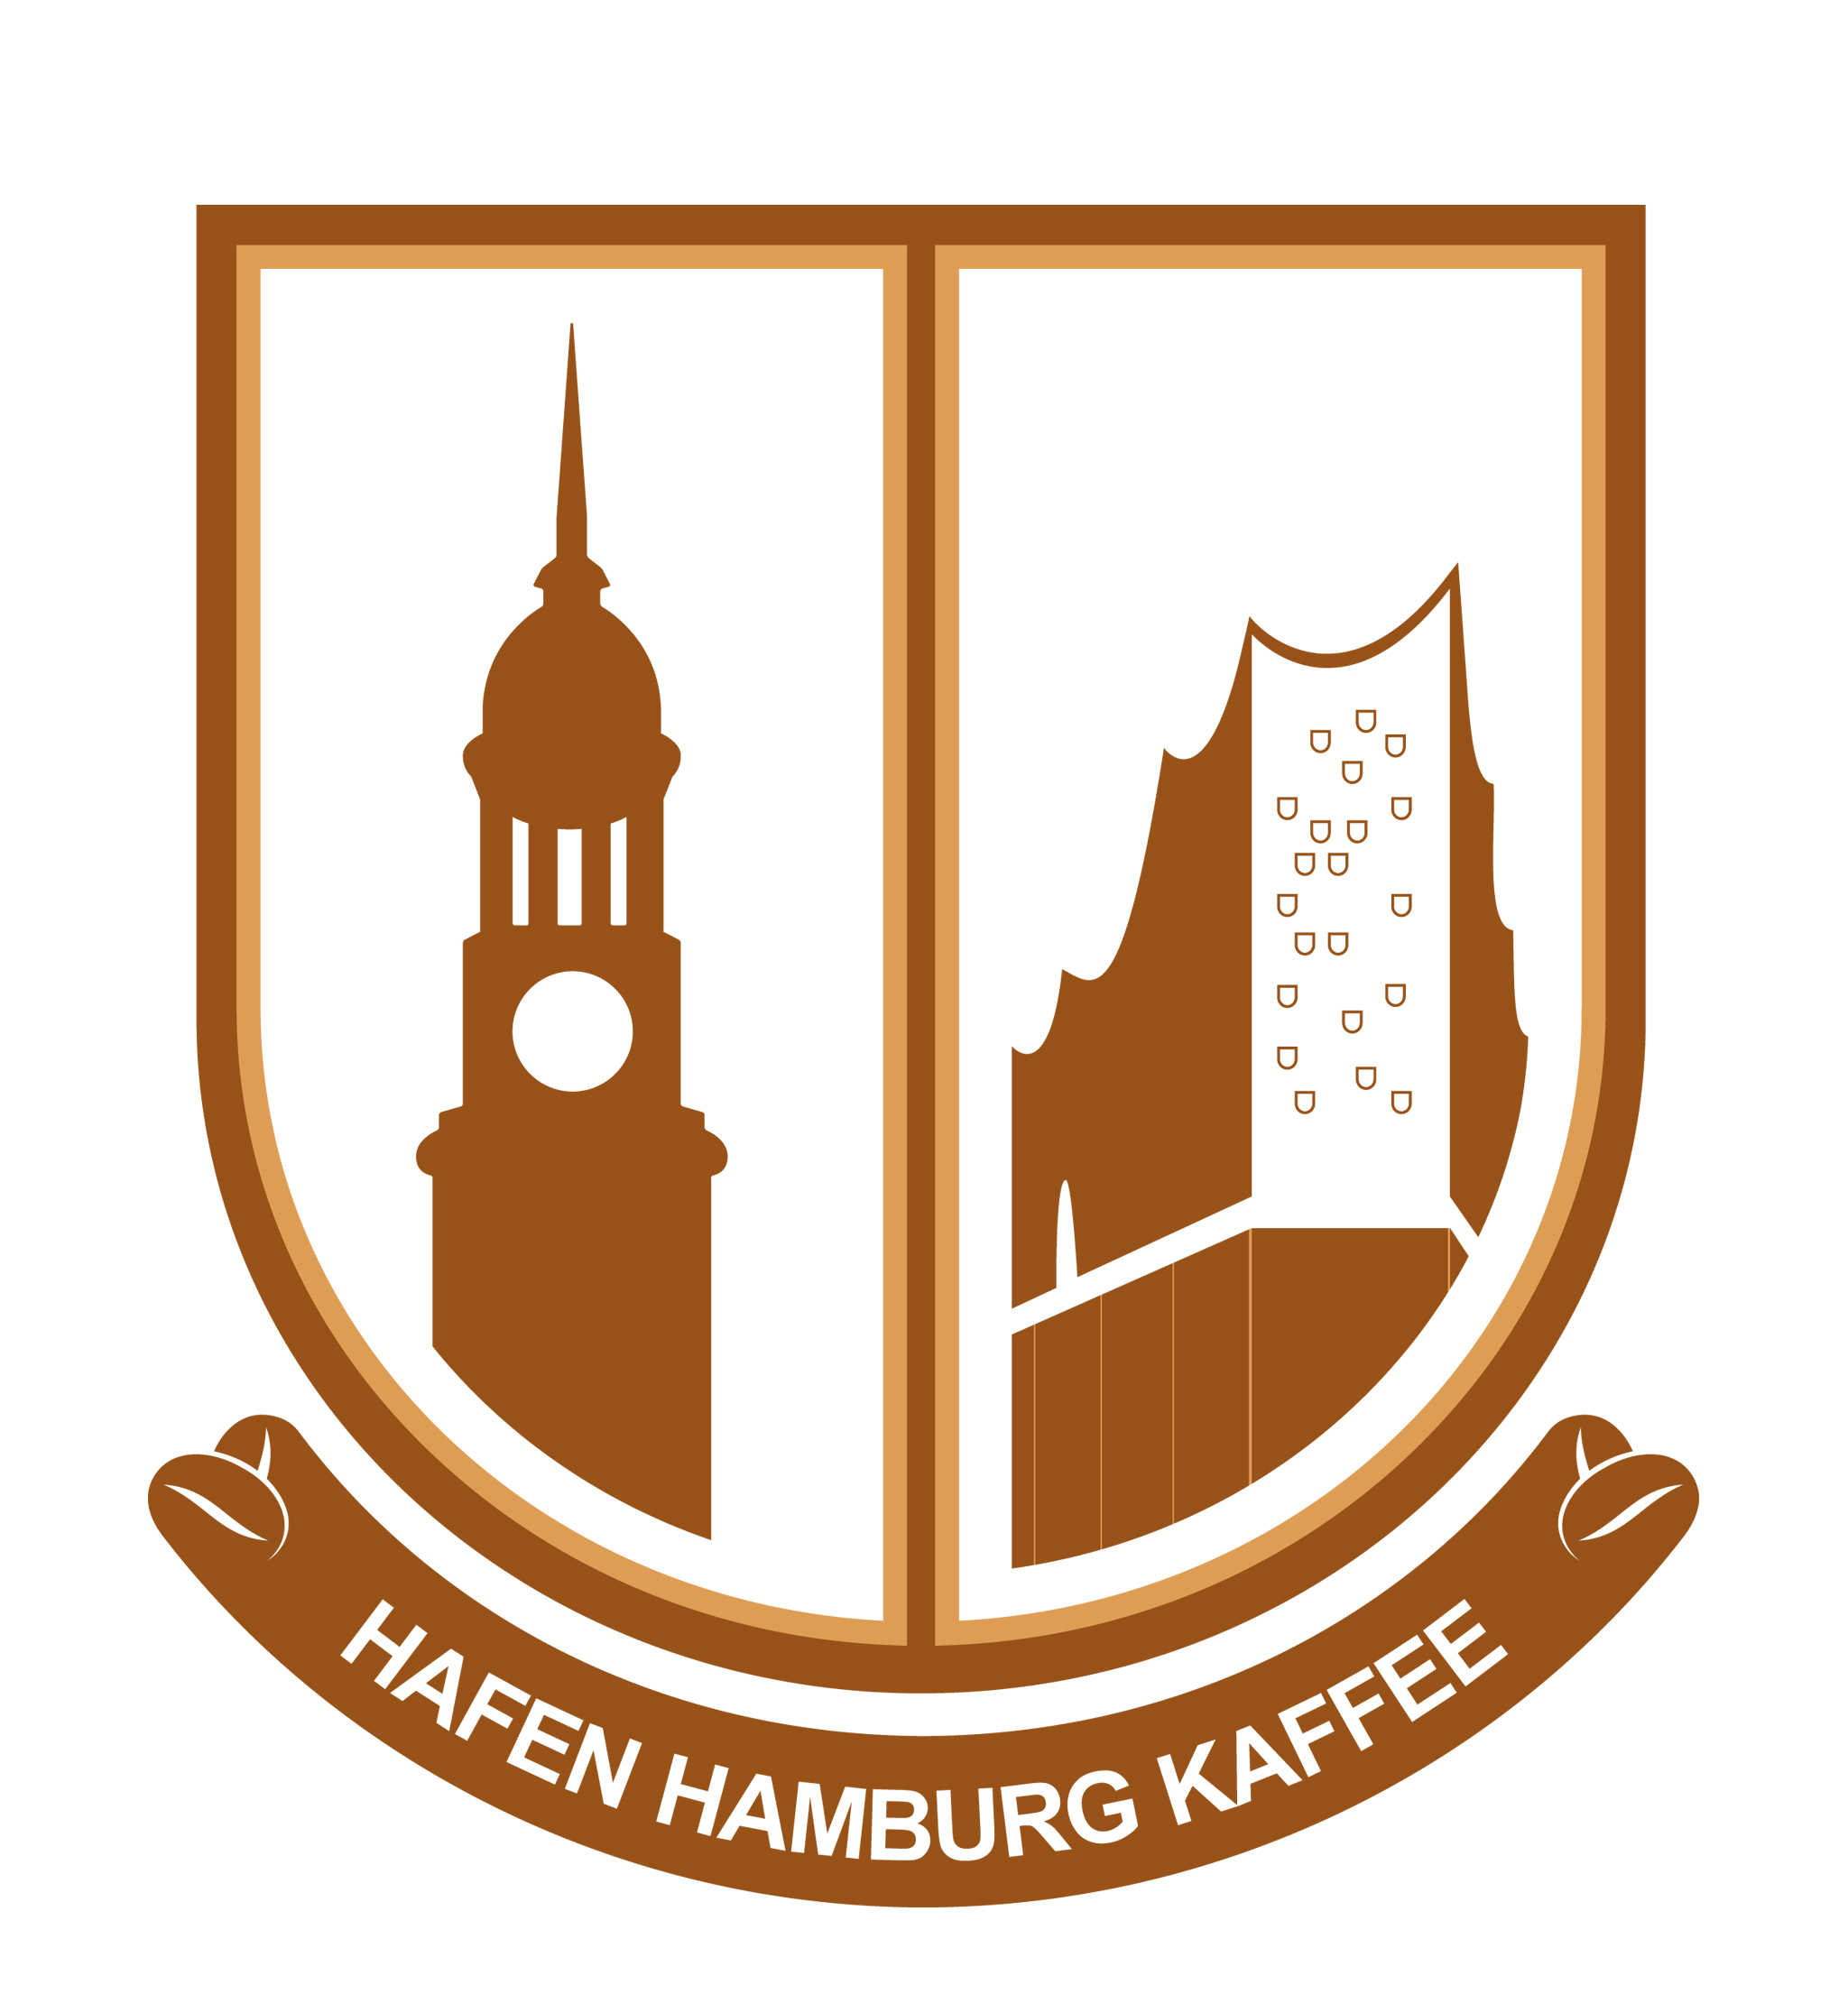 Hafen Hamburg Kaffee